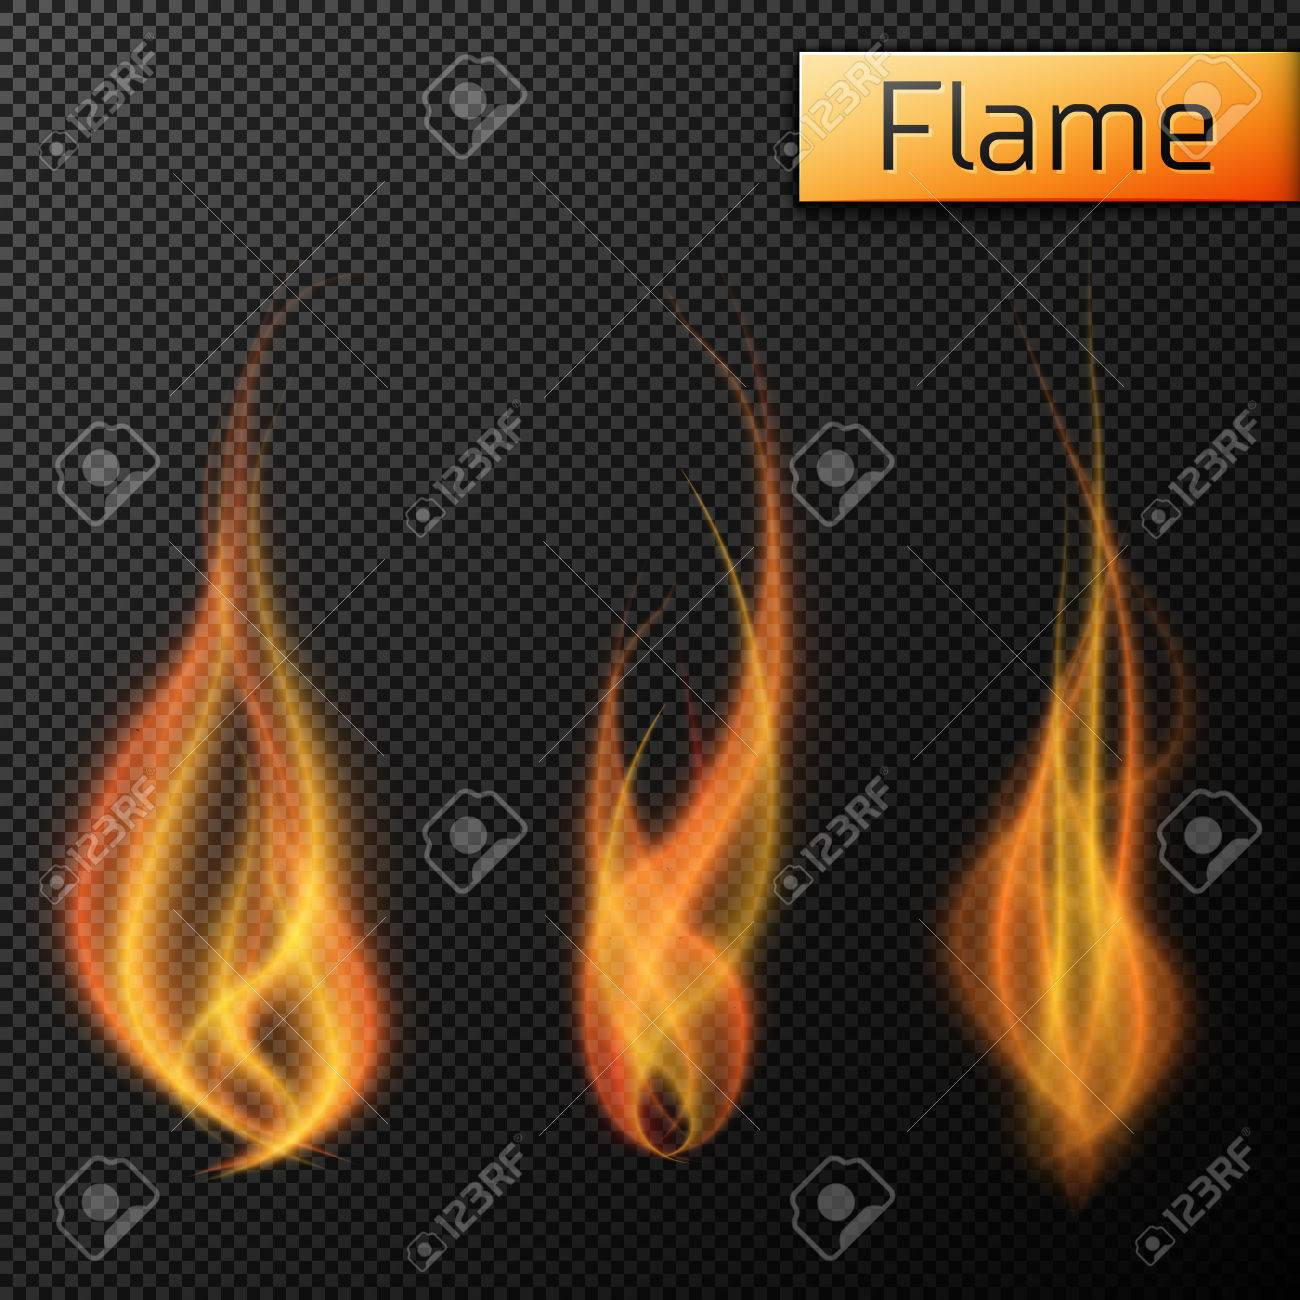 Fire flames vectors on transparent background. Vector illustration, EPS 10 - 51133138